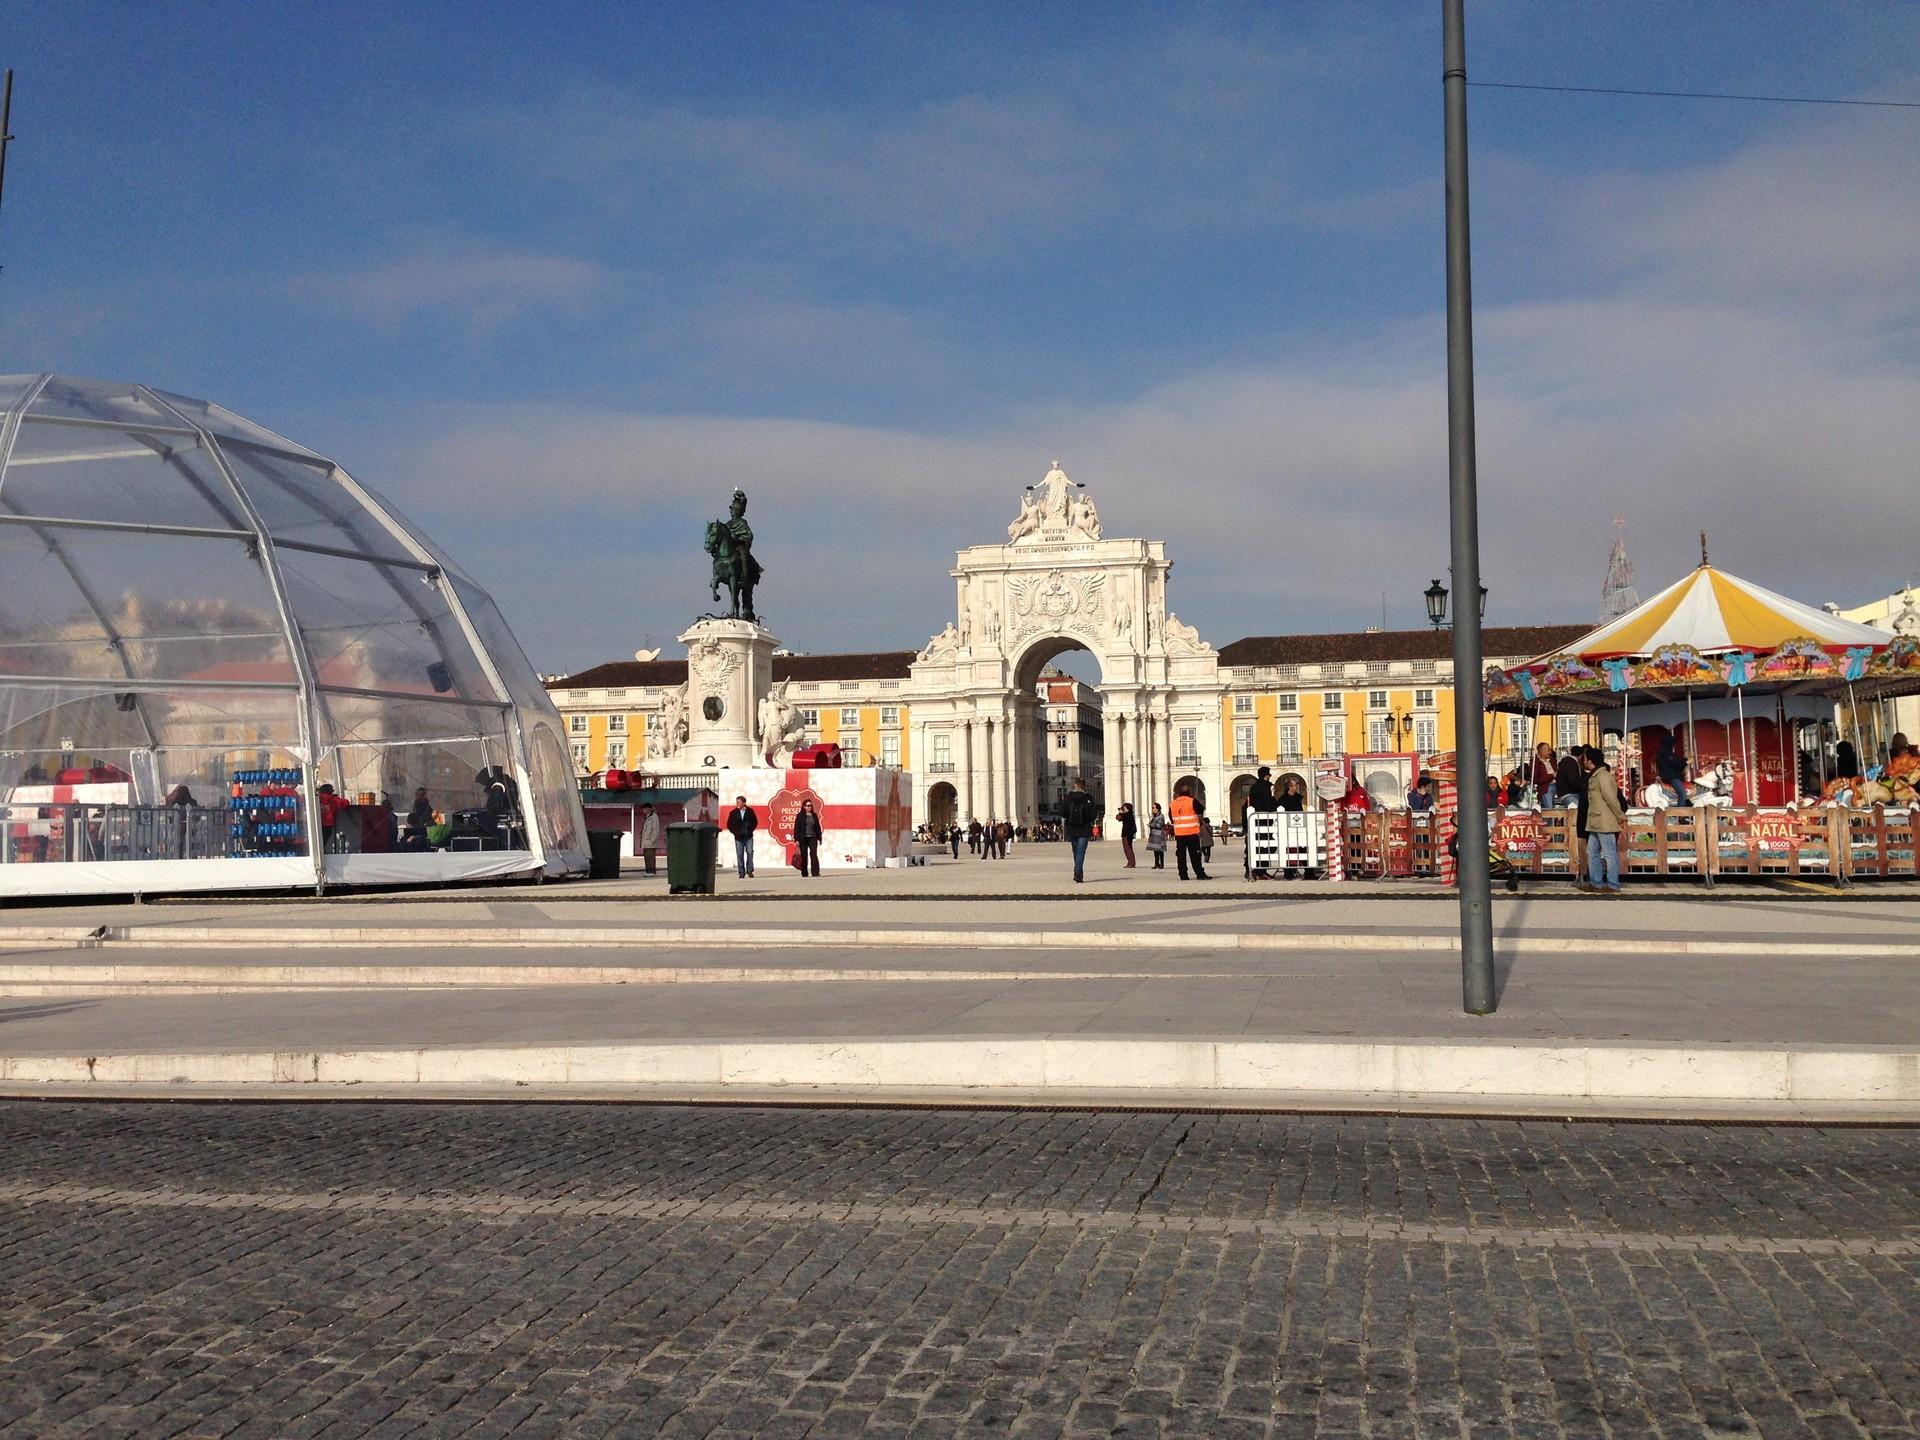 lisbonz-dintorni-piazza-commercio-f393c6